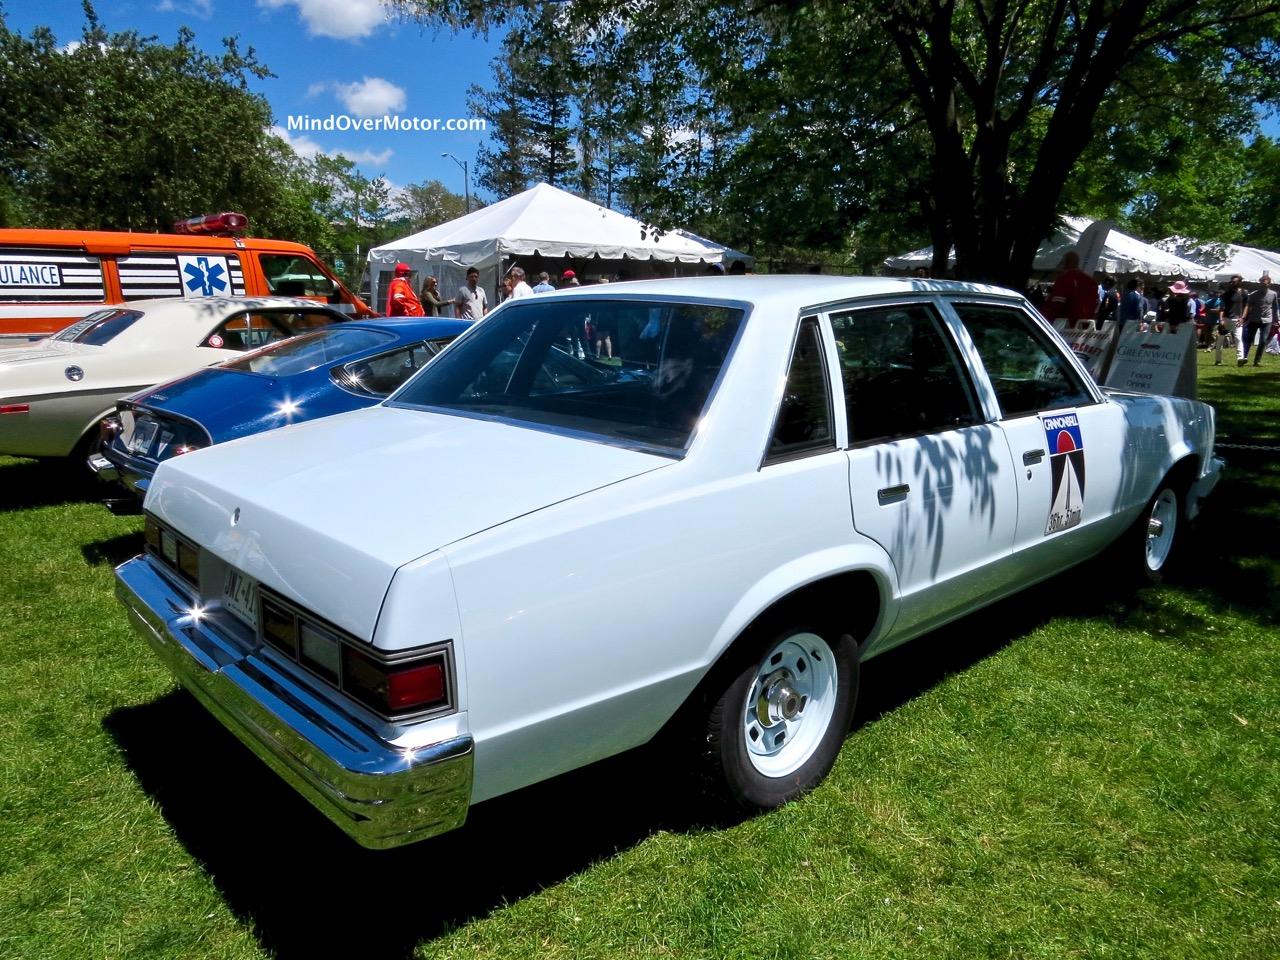 Malibu Police Car Rear